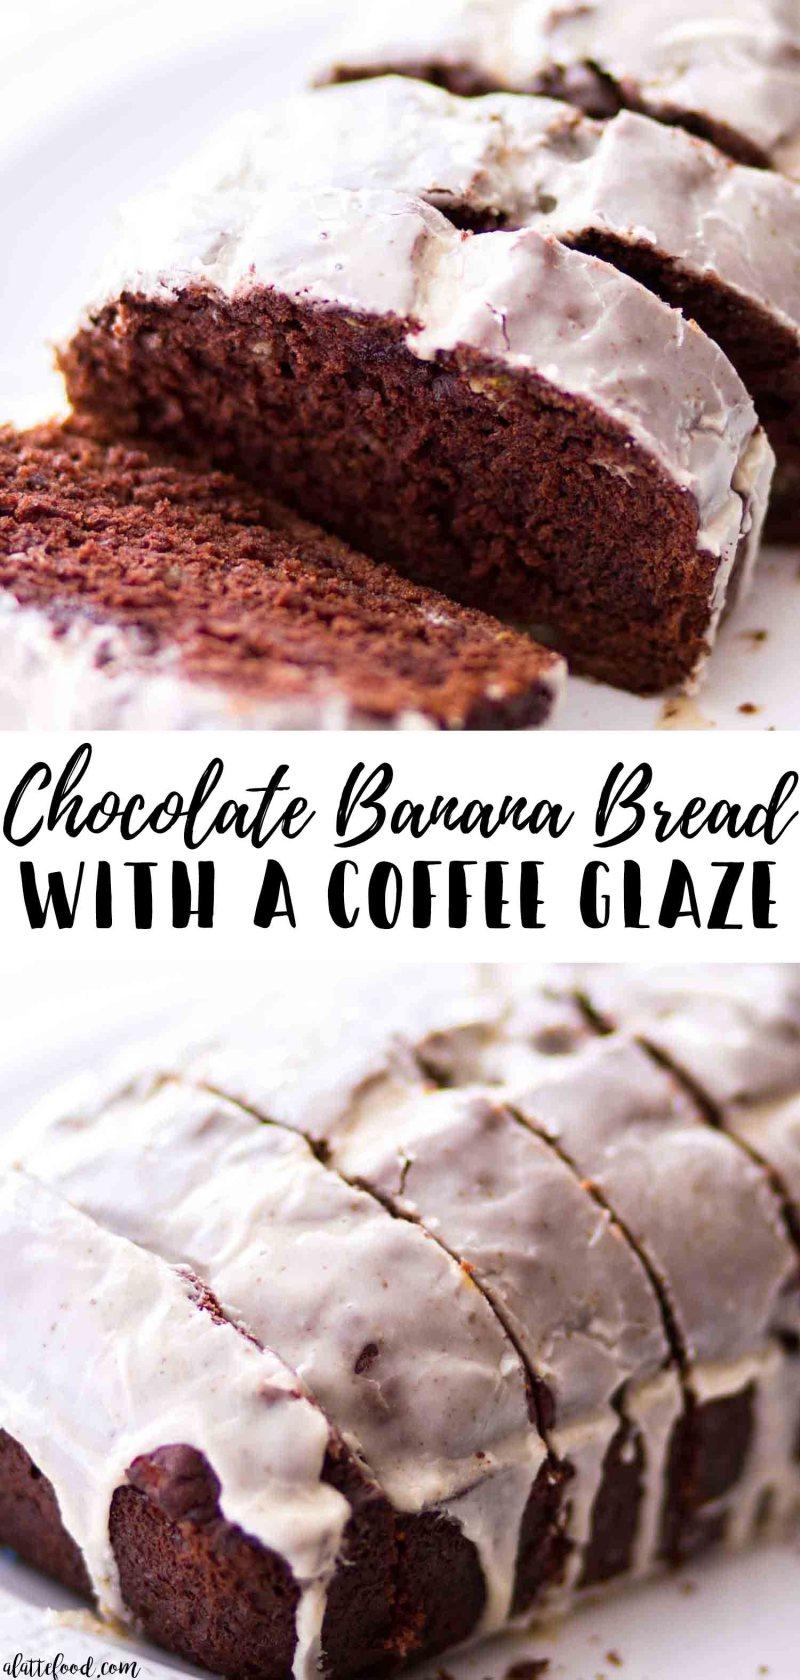 Easy chocolate banana bread with a coffee glaze